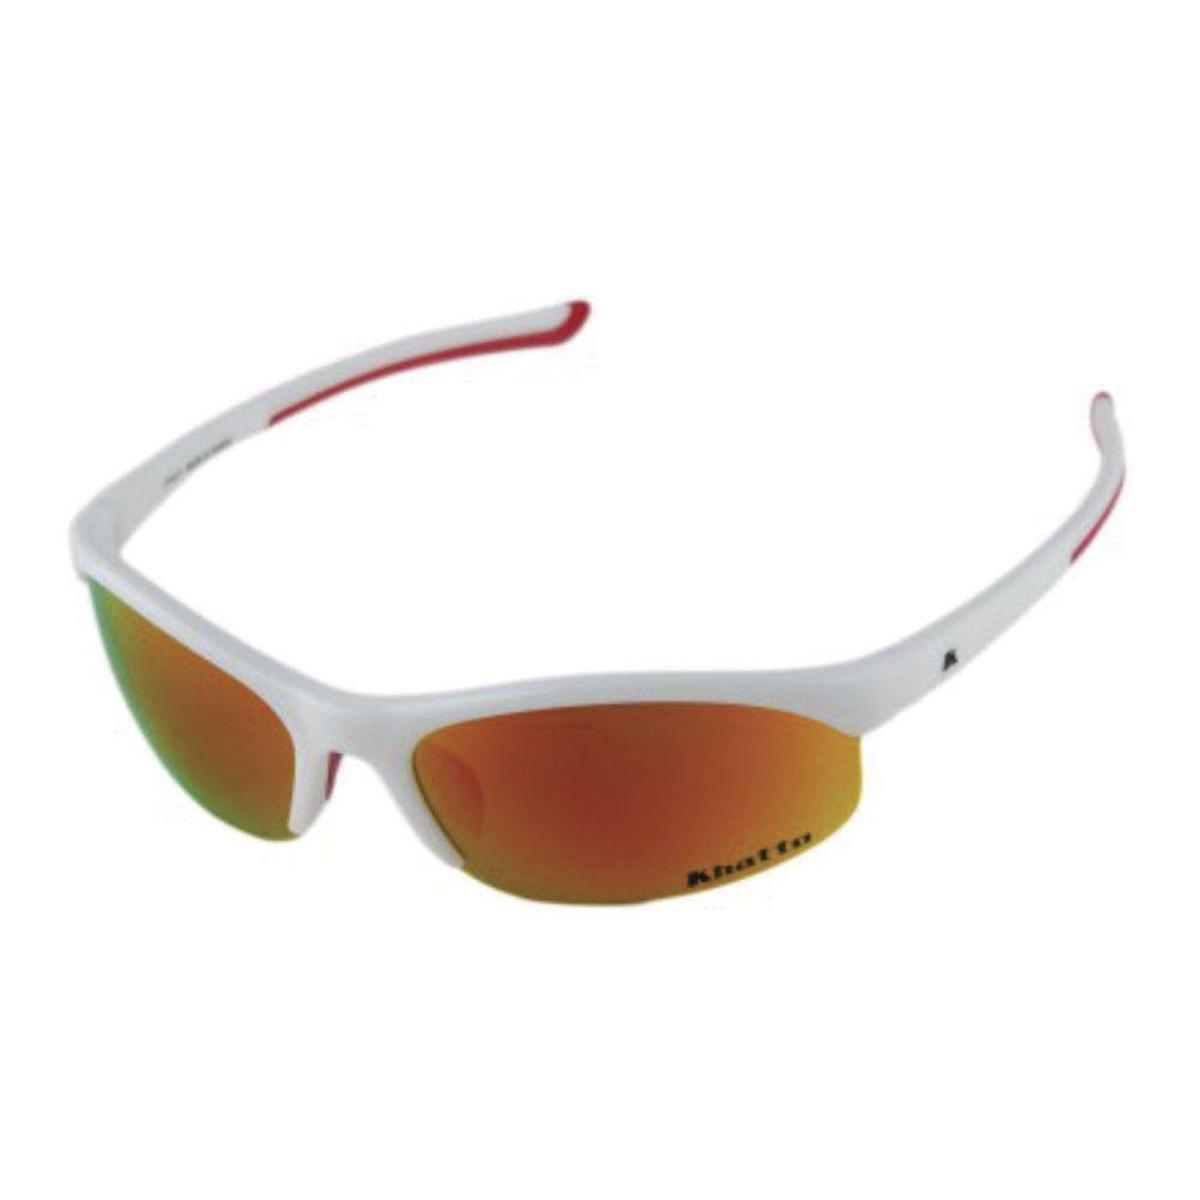 Óculos de Sol Khatto Esportivo Masculino - Branco - Compre Agora ... d399ef39bf